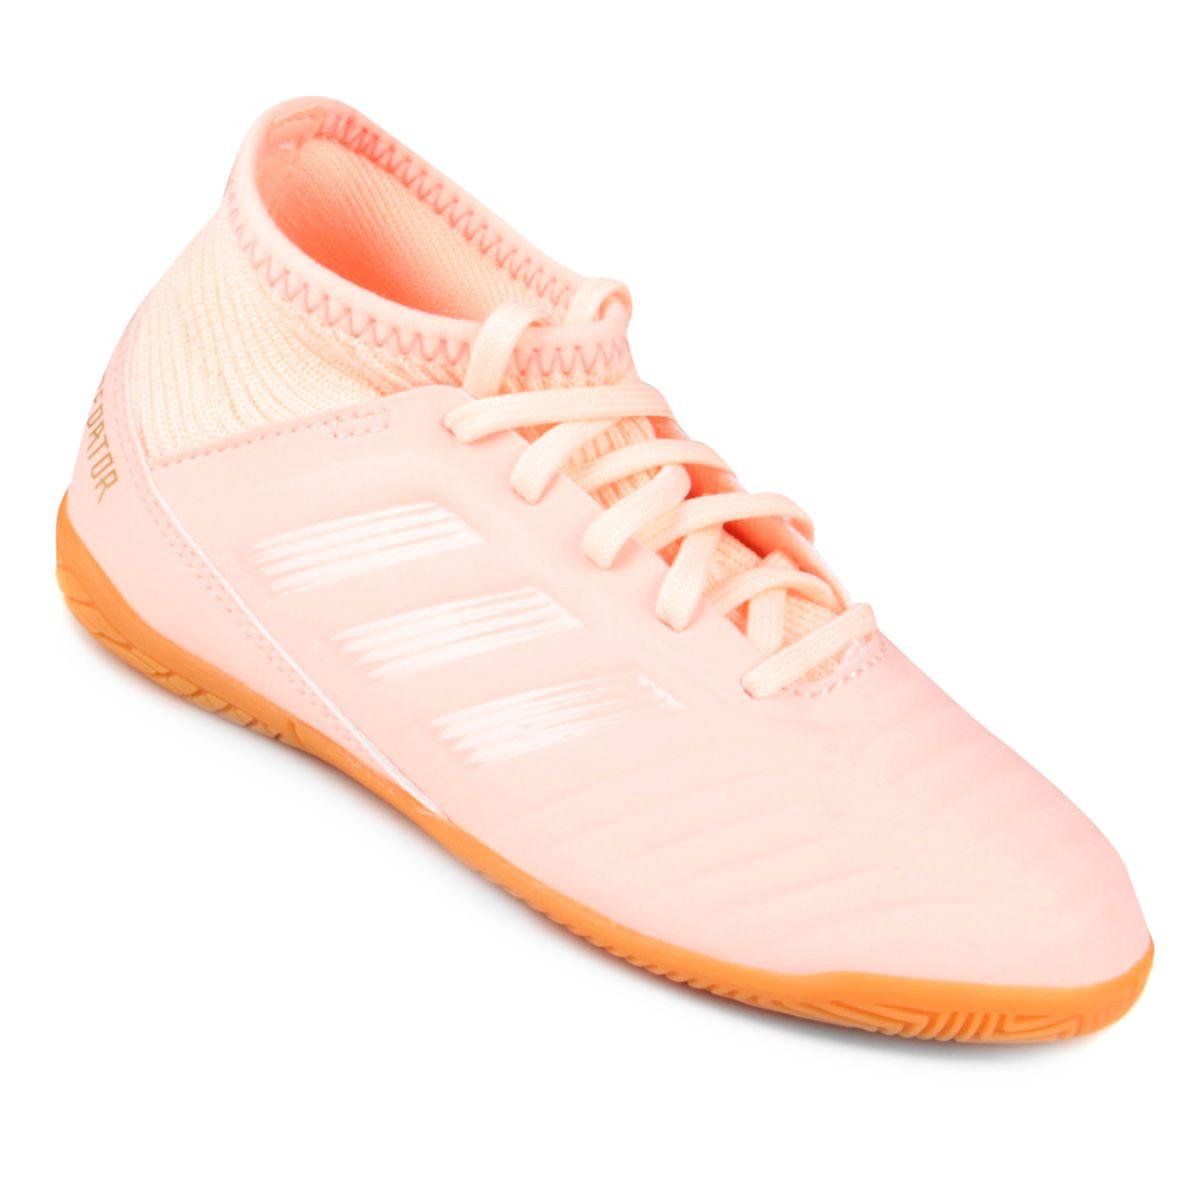 b85cfc249 Chuteira Futsal Infantil Adidas Predator 18 3 IN - Compre Agora ...